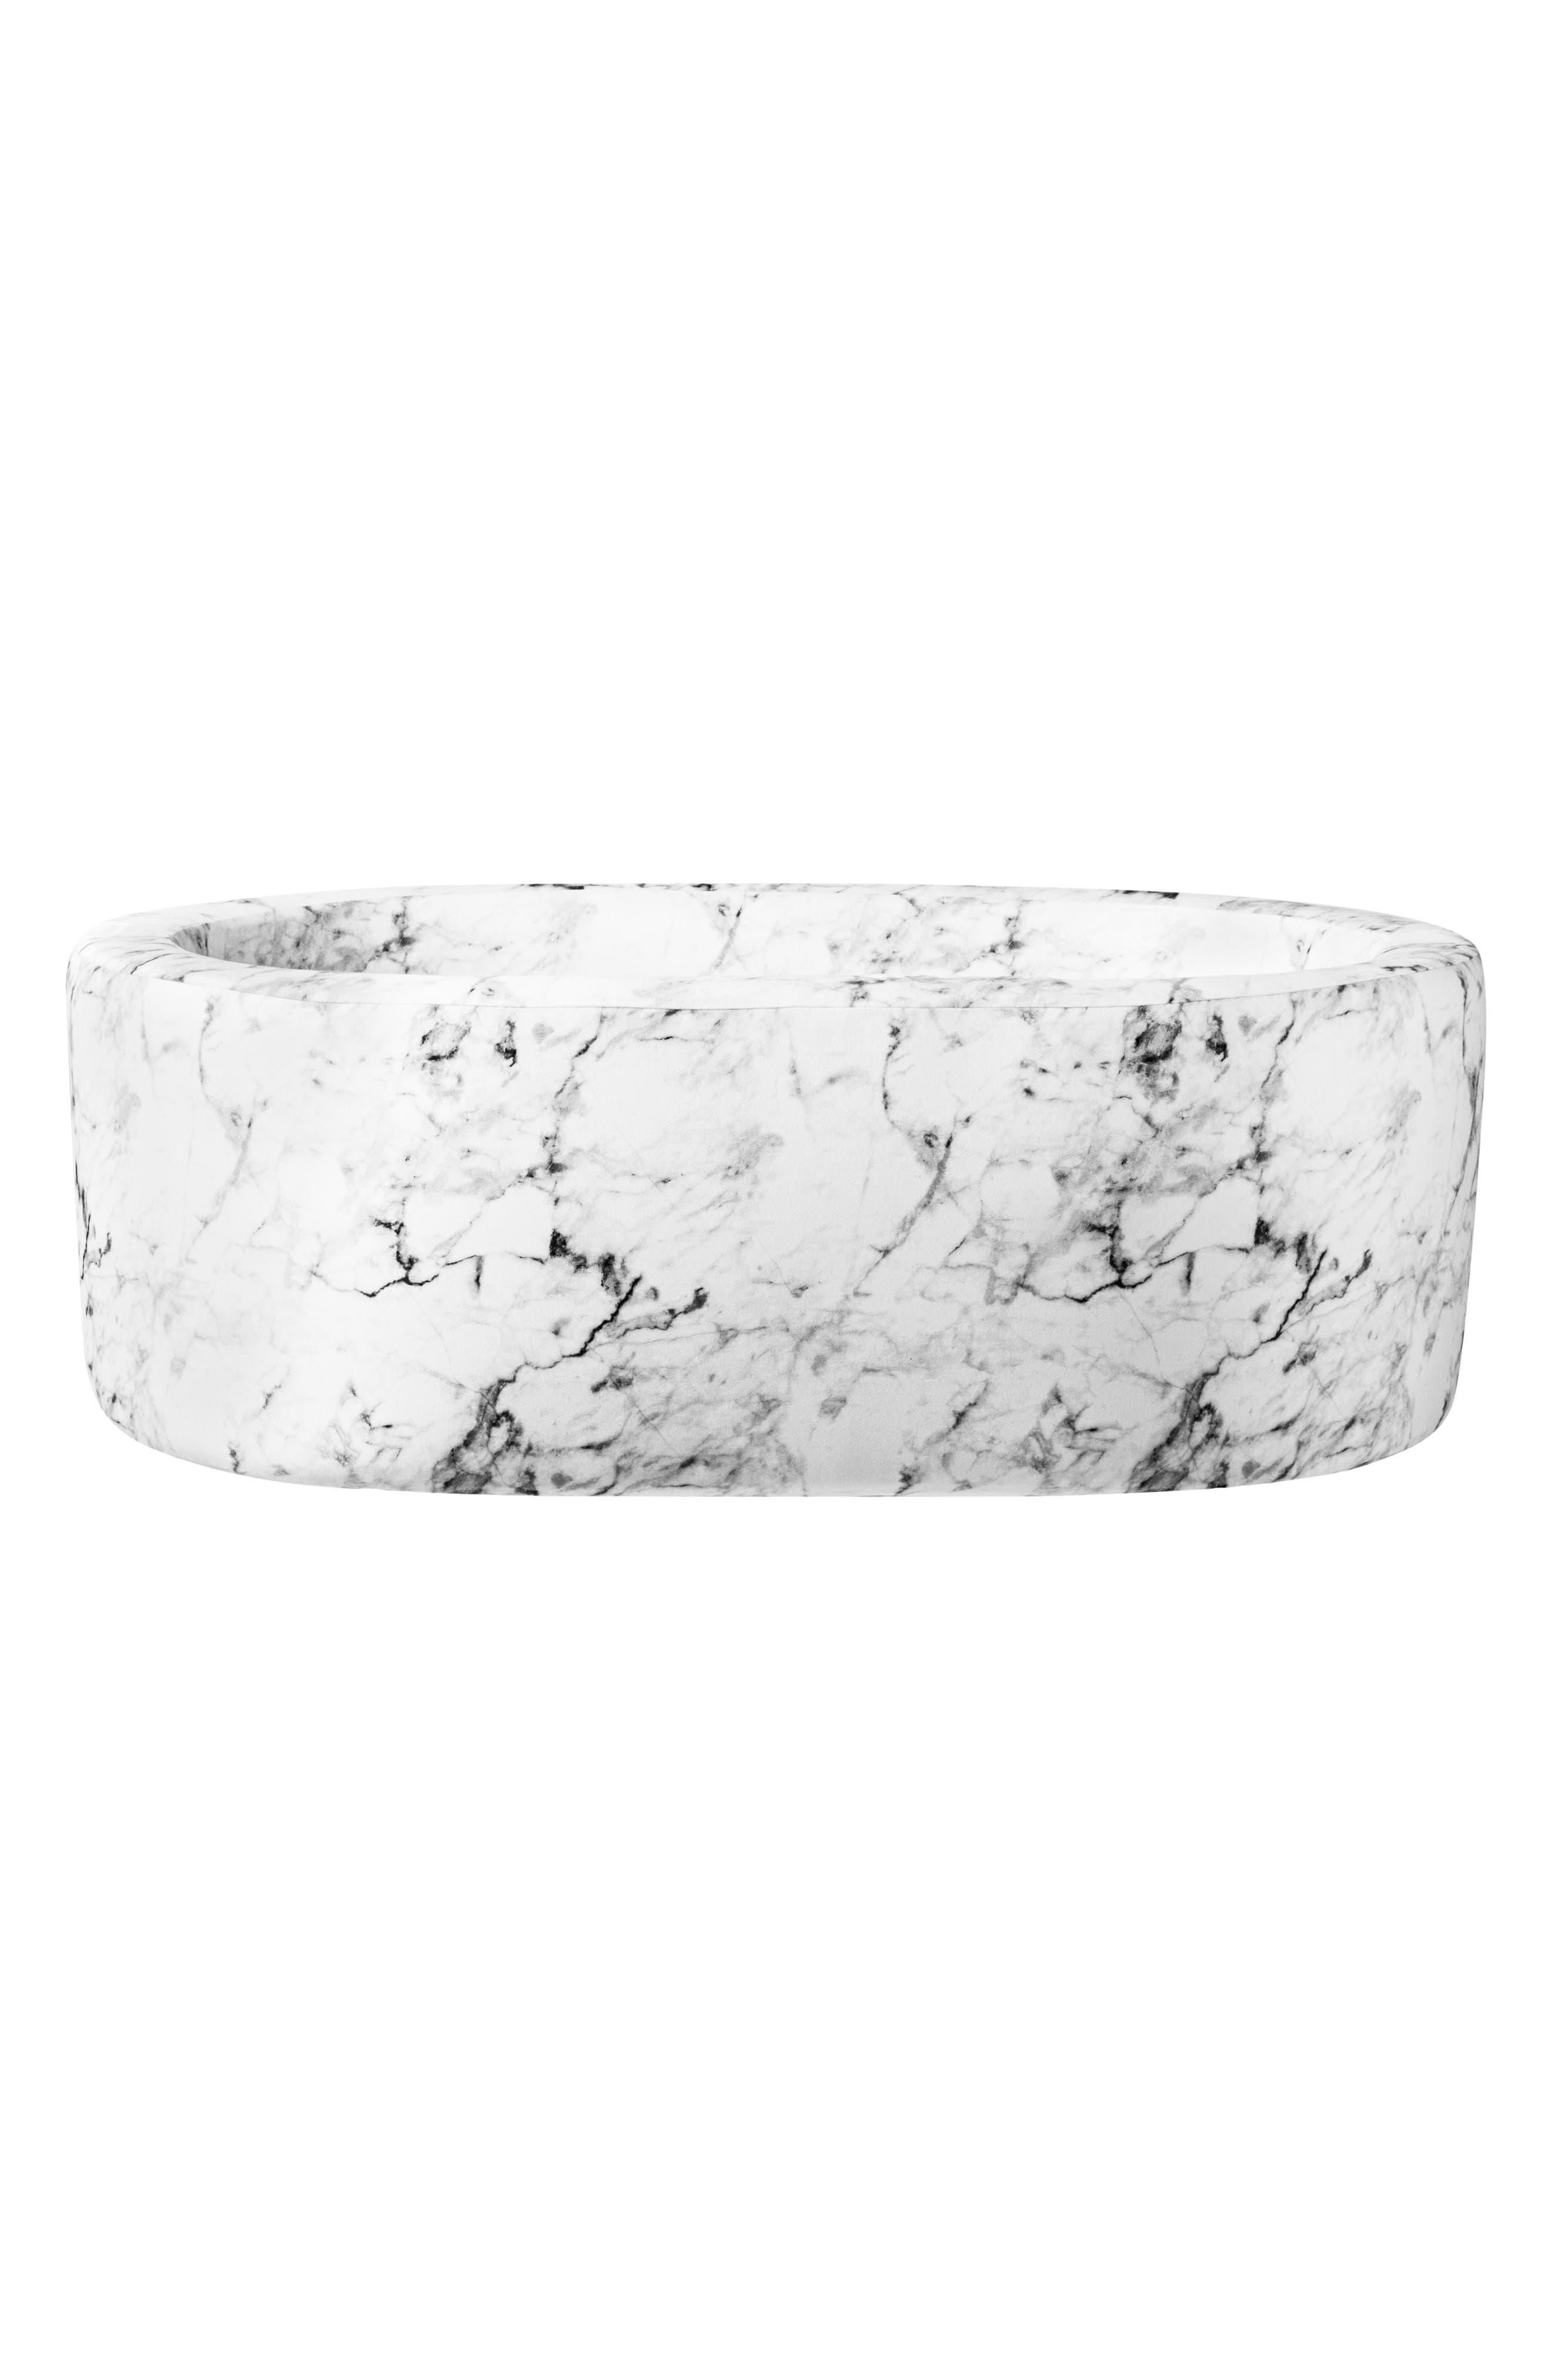 Aristot Infant Aristot Carrara Marble Print Modular Bassinet, Size One Size - Grey